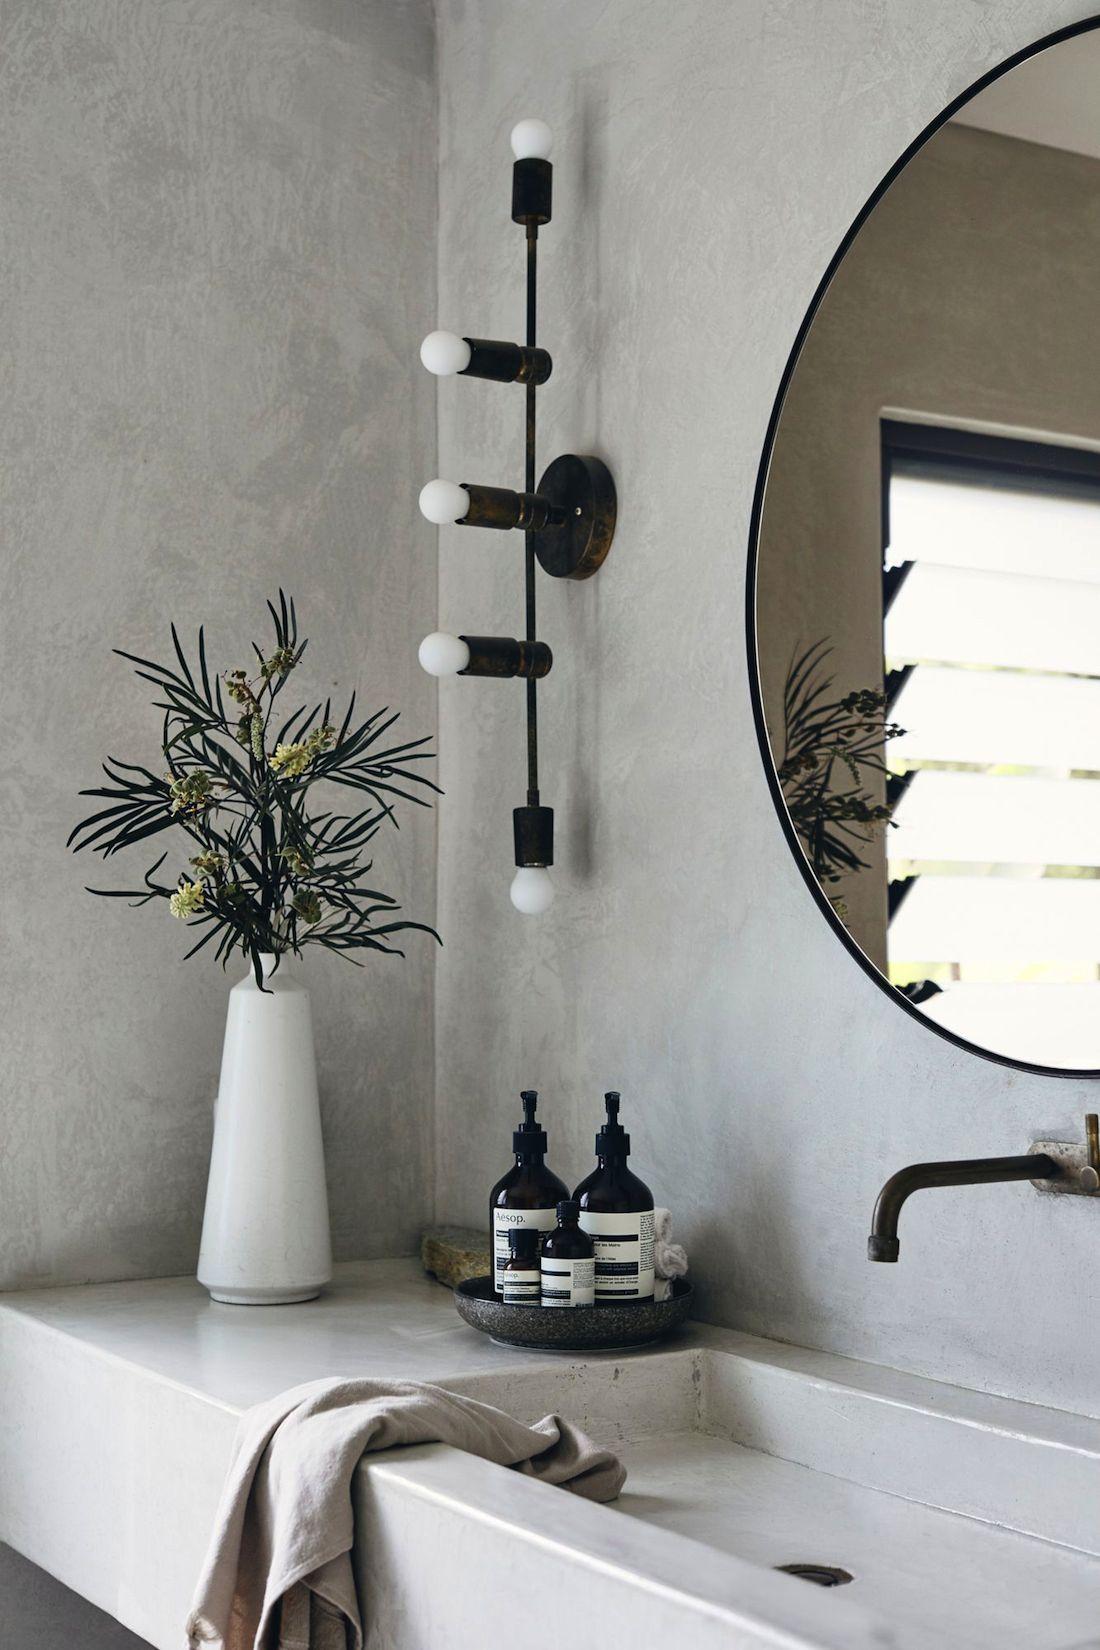 Bathroom with sink built into vanity